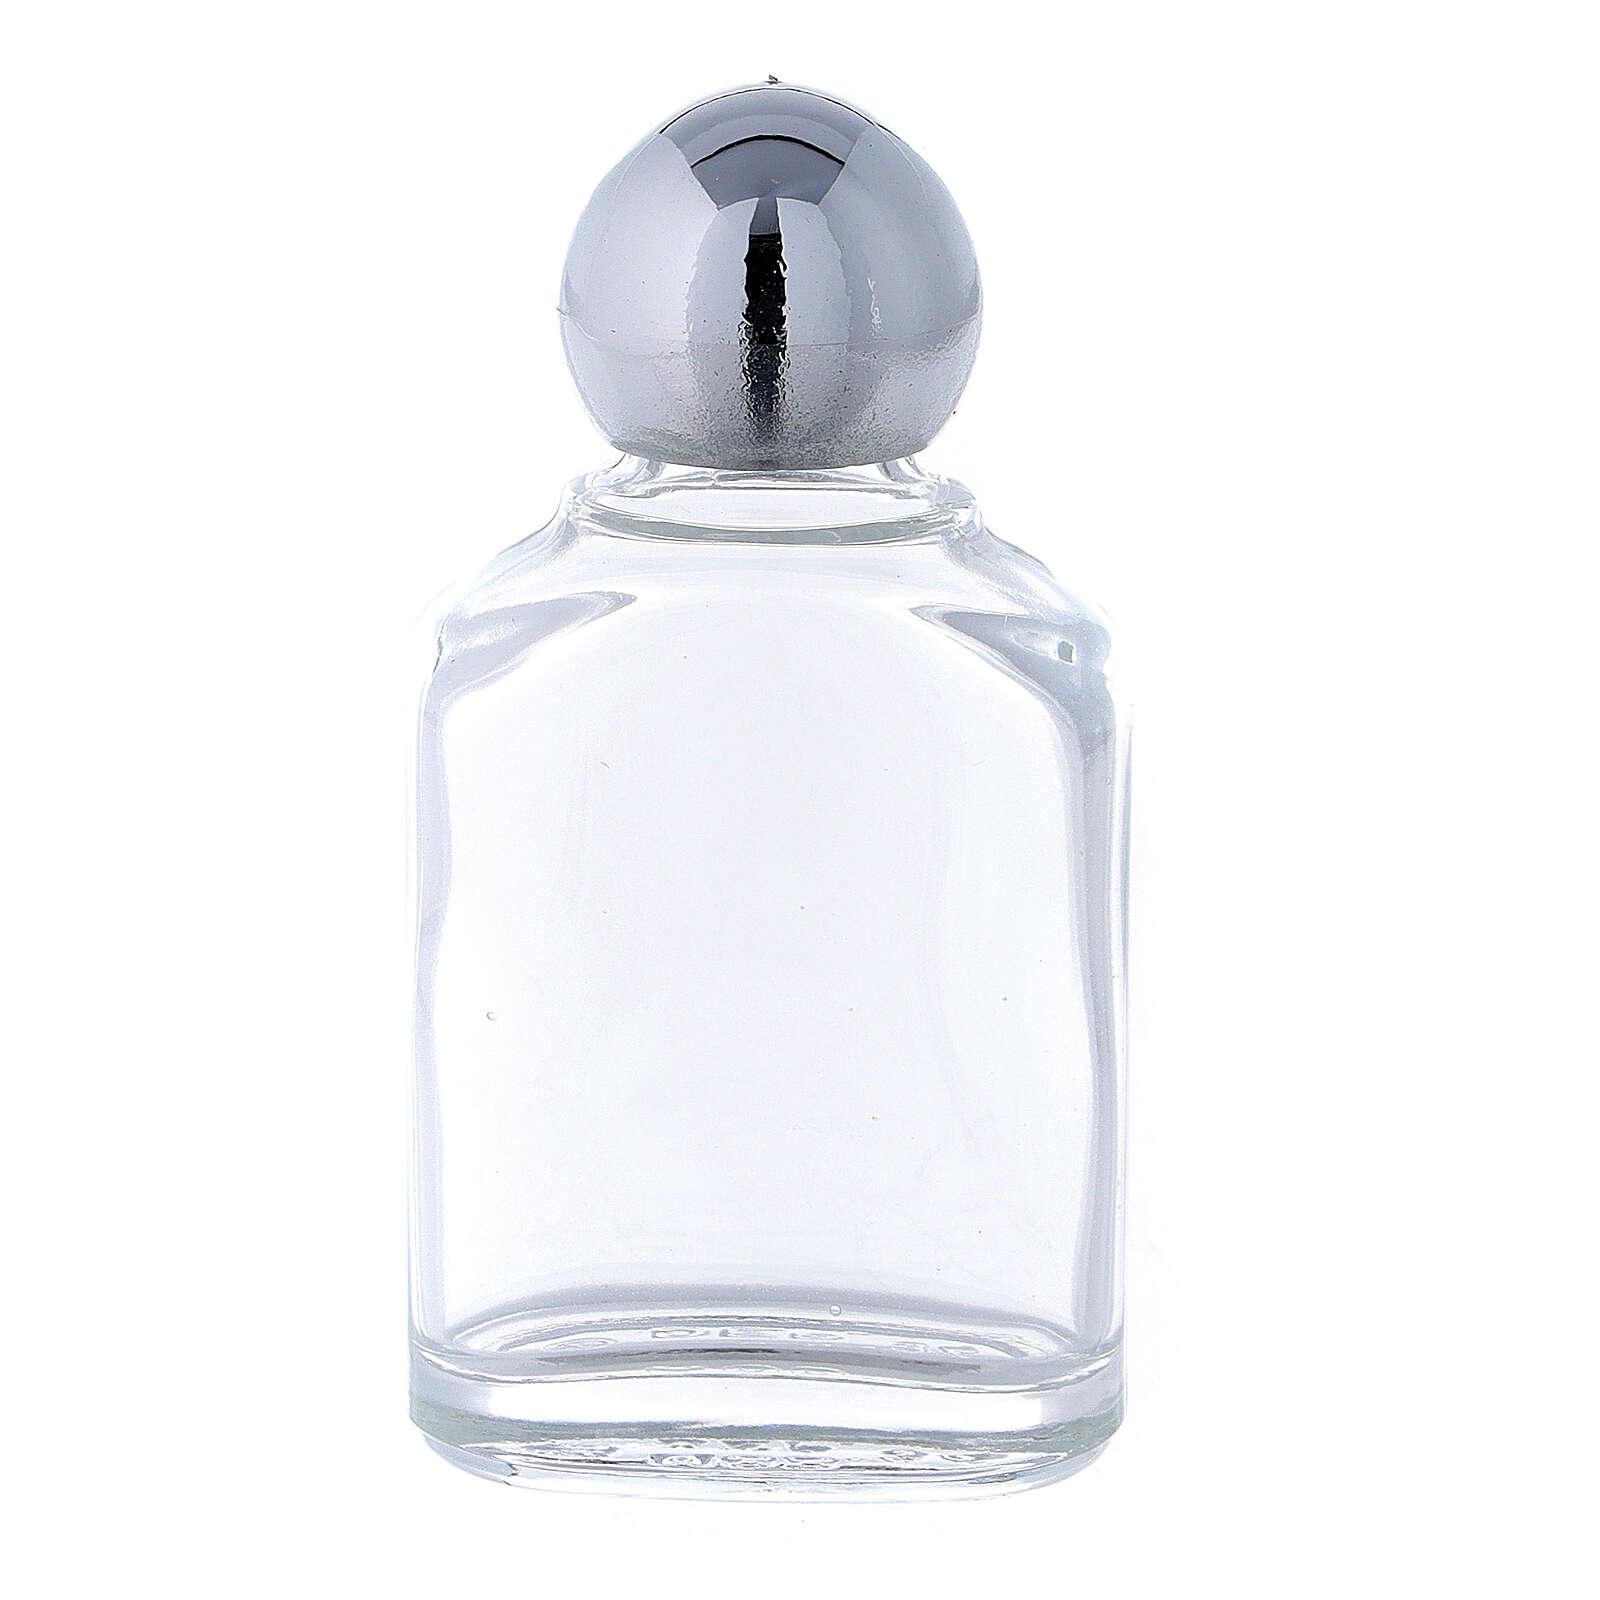 10 ml glass holy water bottle (50 pcs) 3